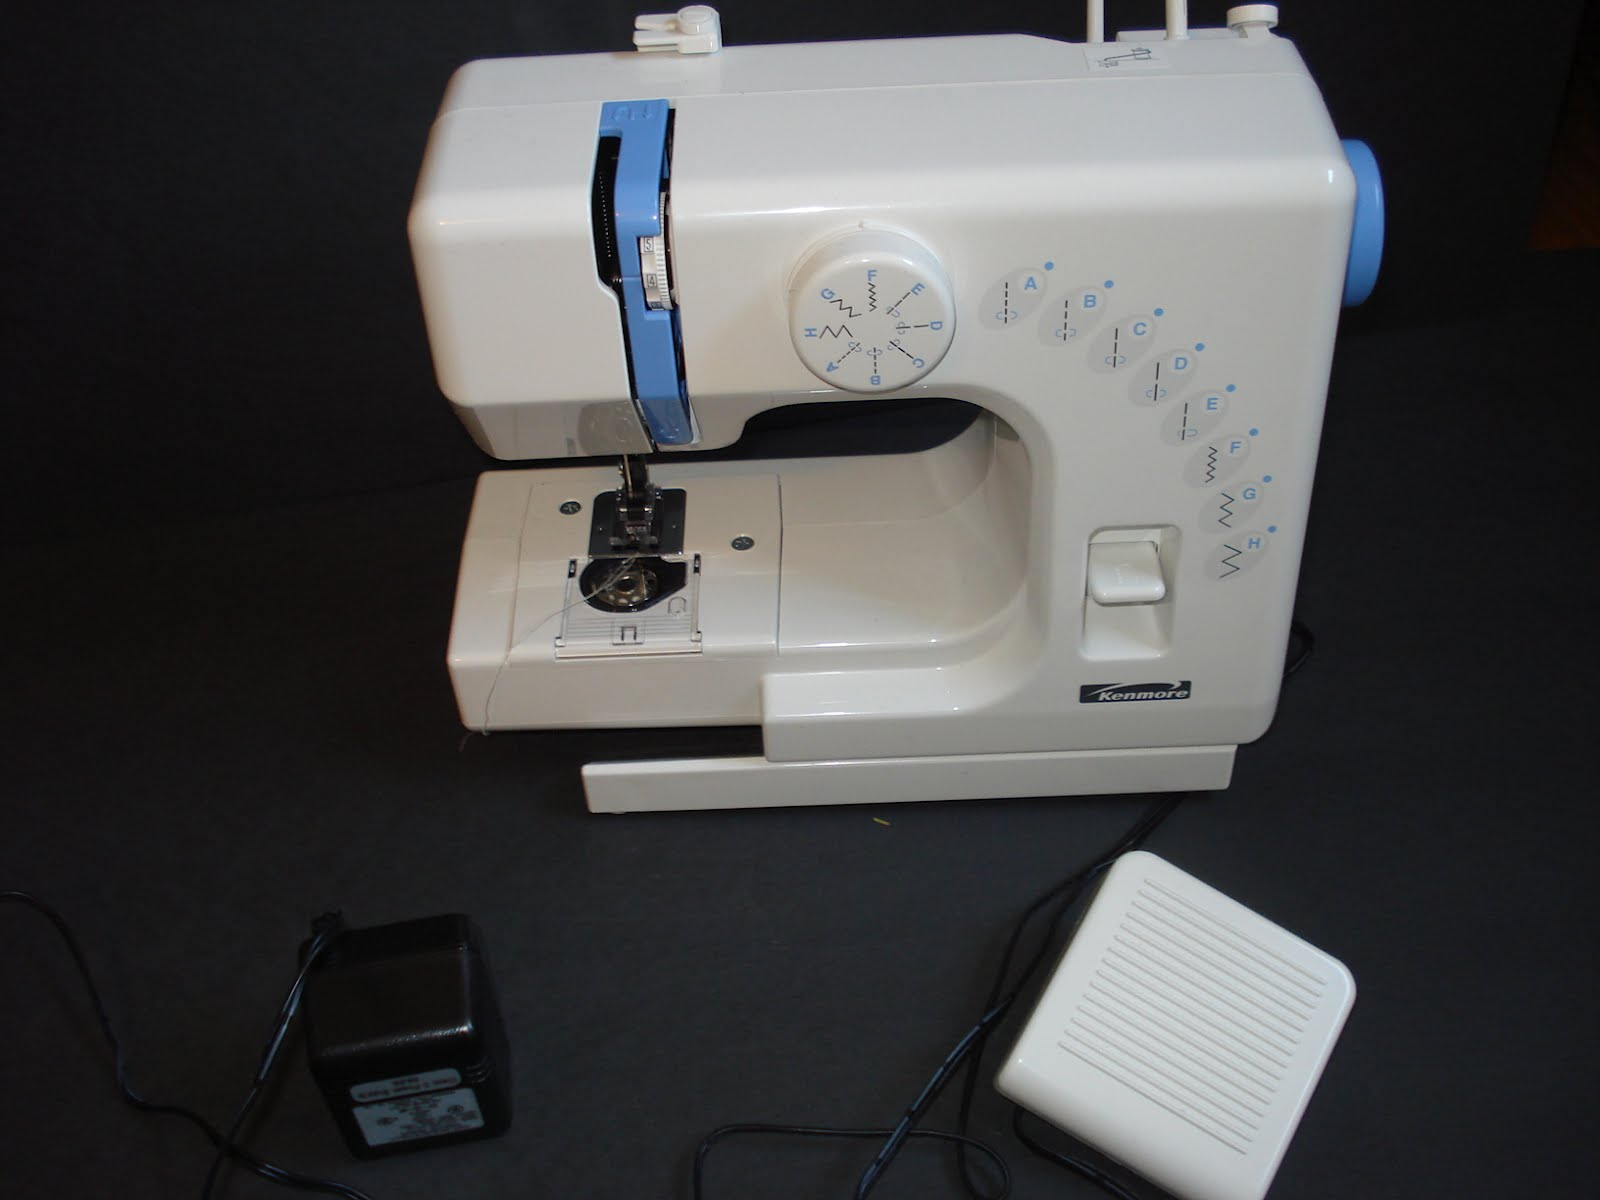 kenmore mini sewing machine